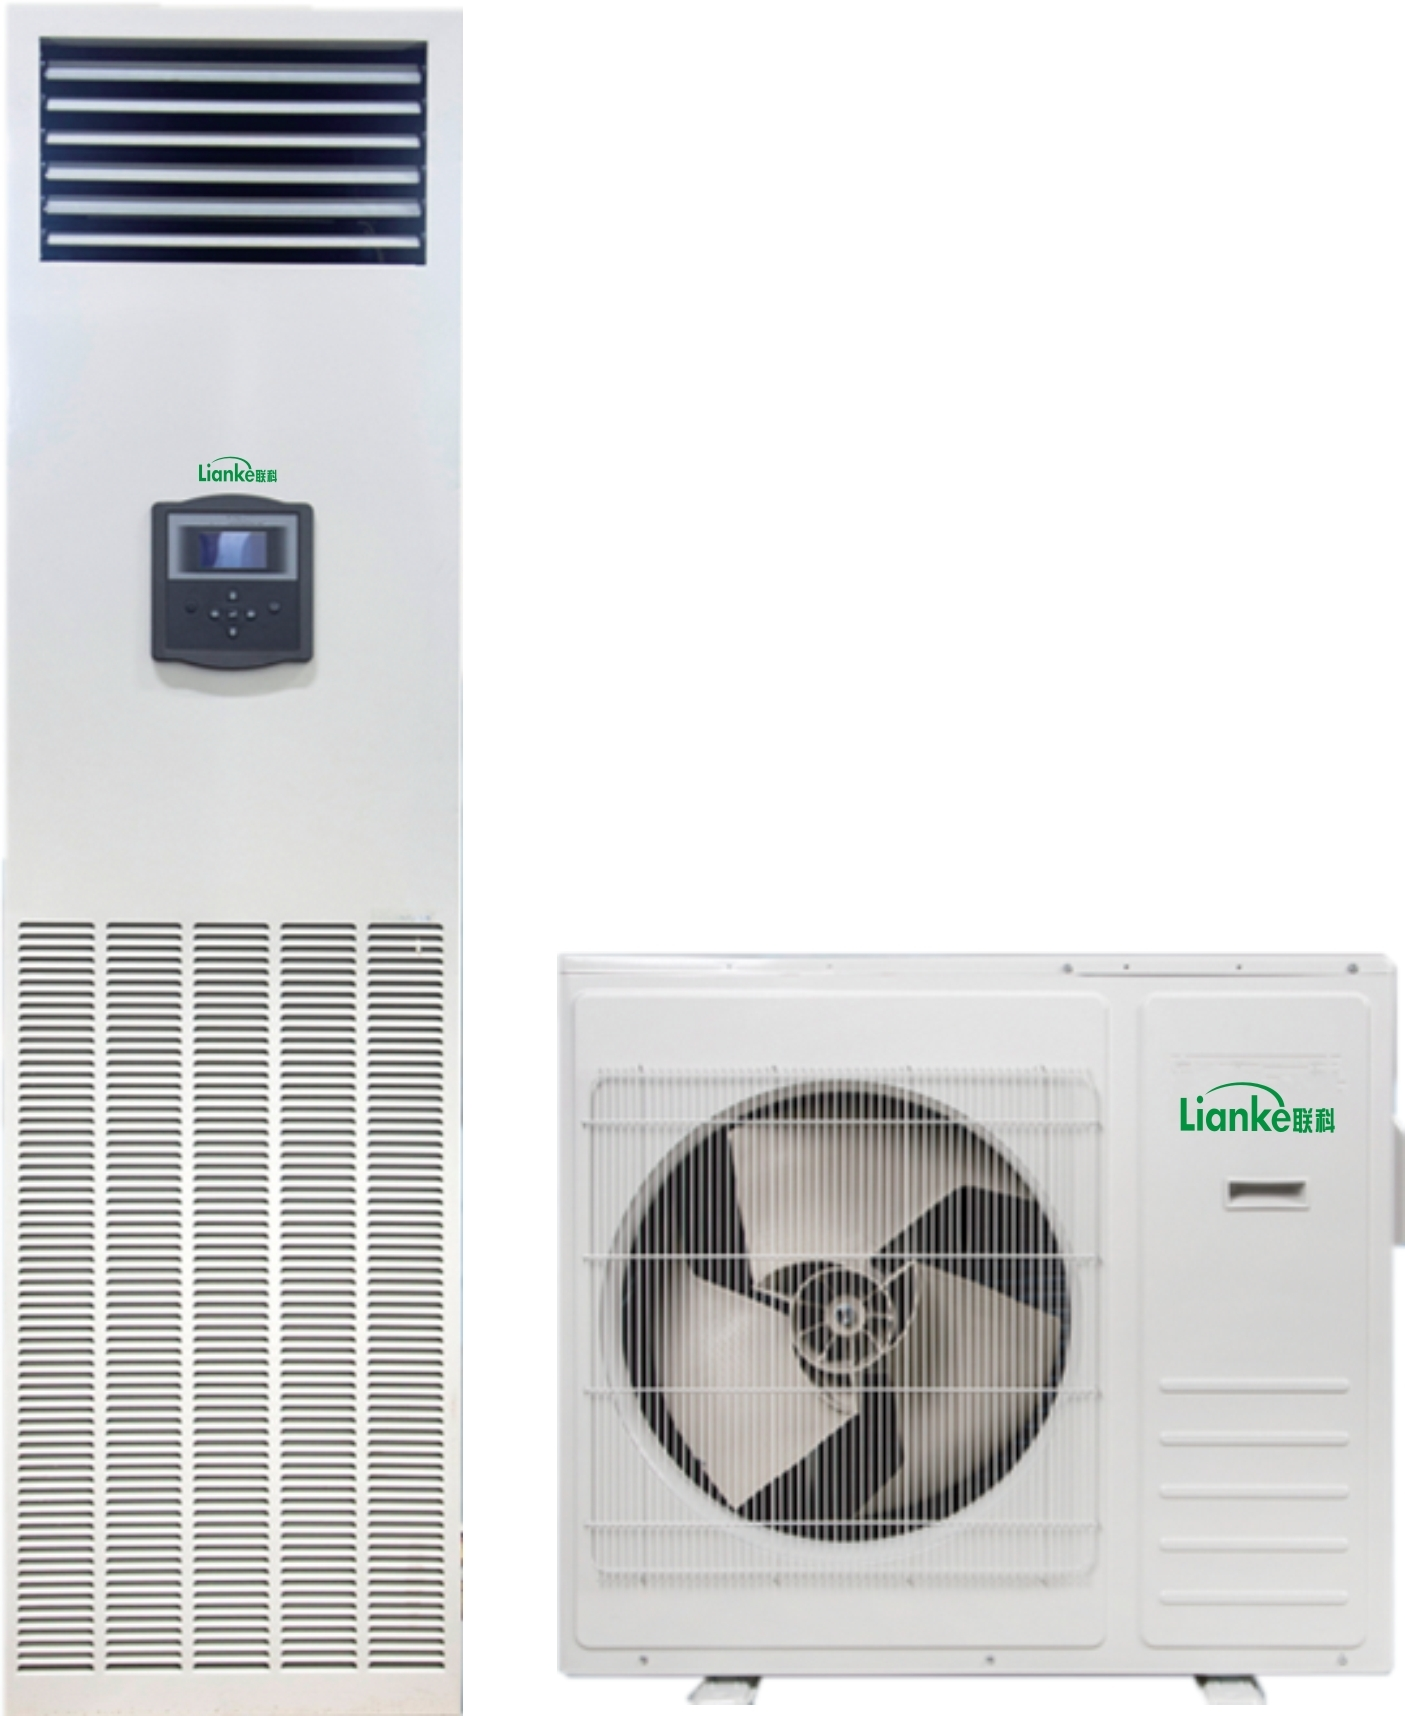 LKA小型風冷機房精密空調(1).jpg